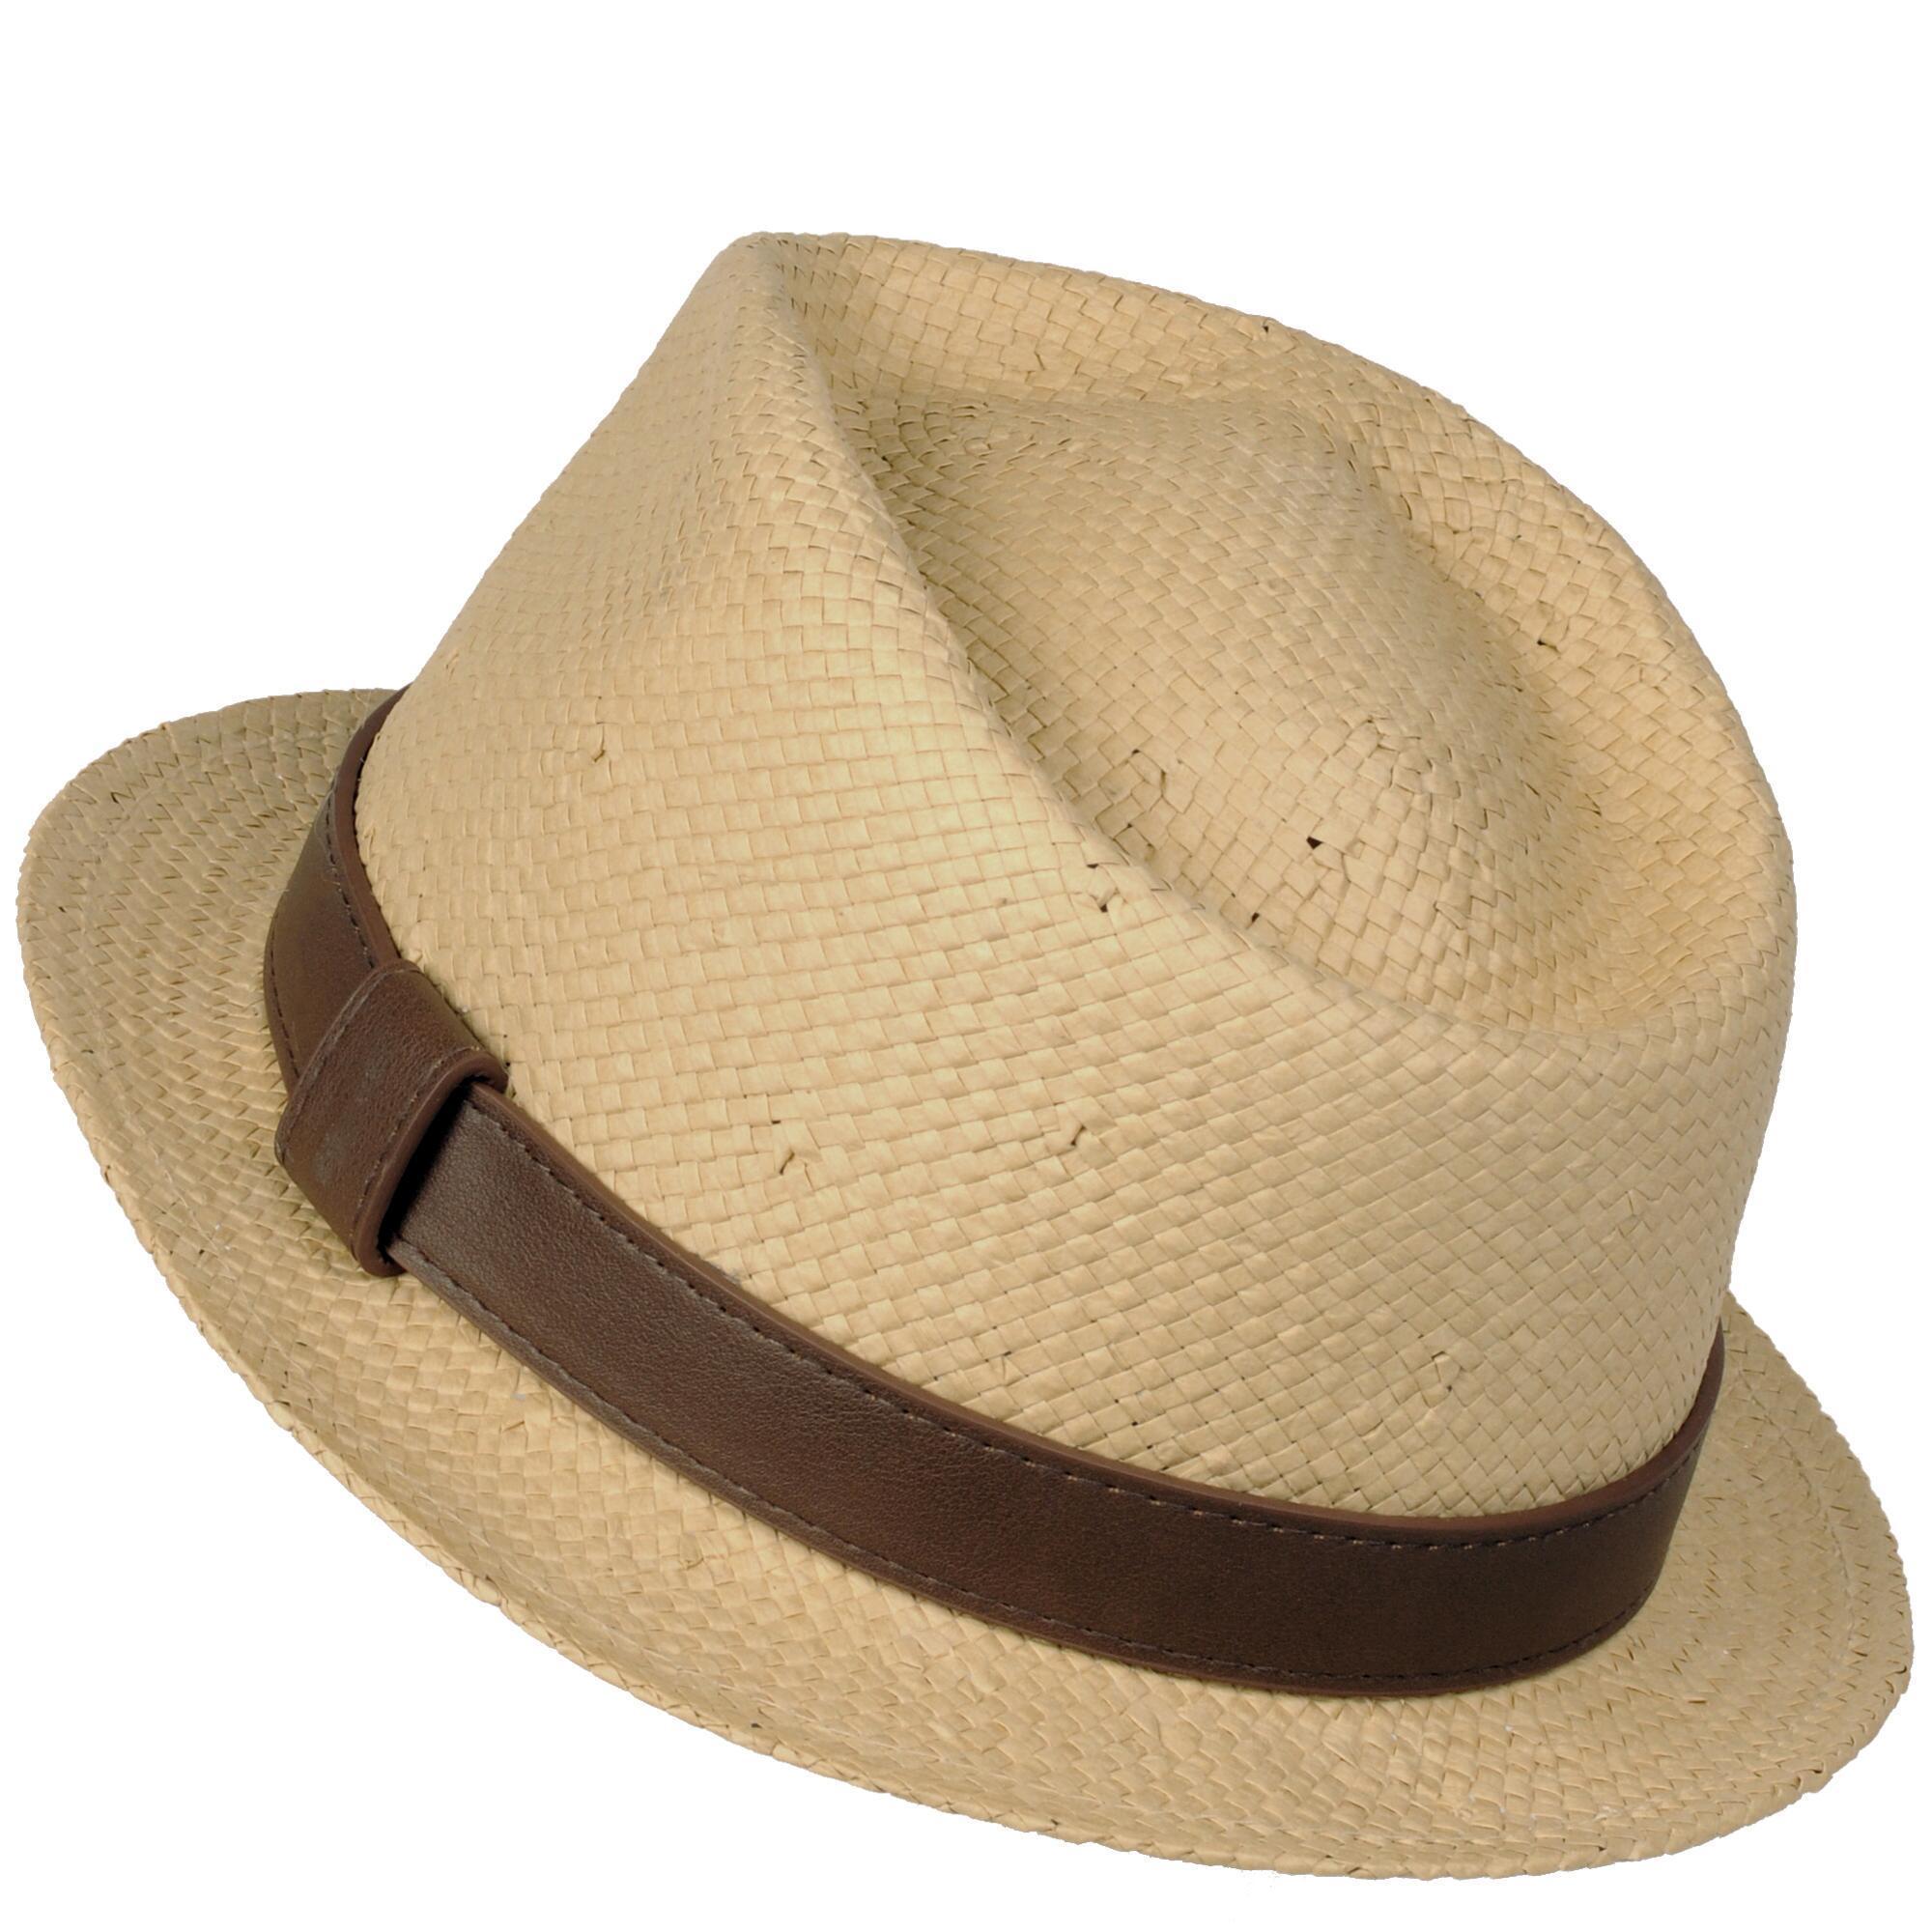 db41a98d359 Wilsons Leather - Natural Paper Flat Brim Fedora Hat for Men - Lyst. View  fullscreen